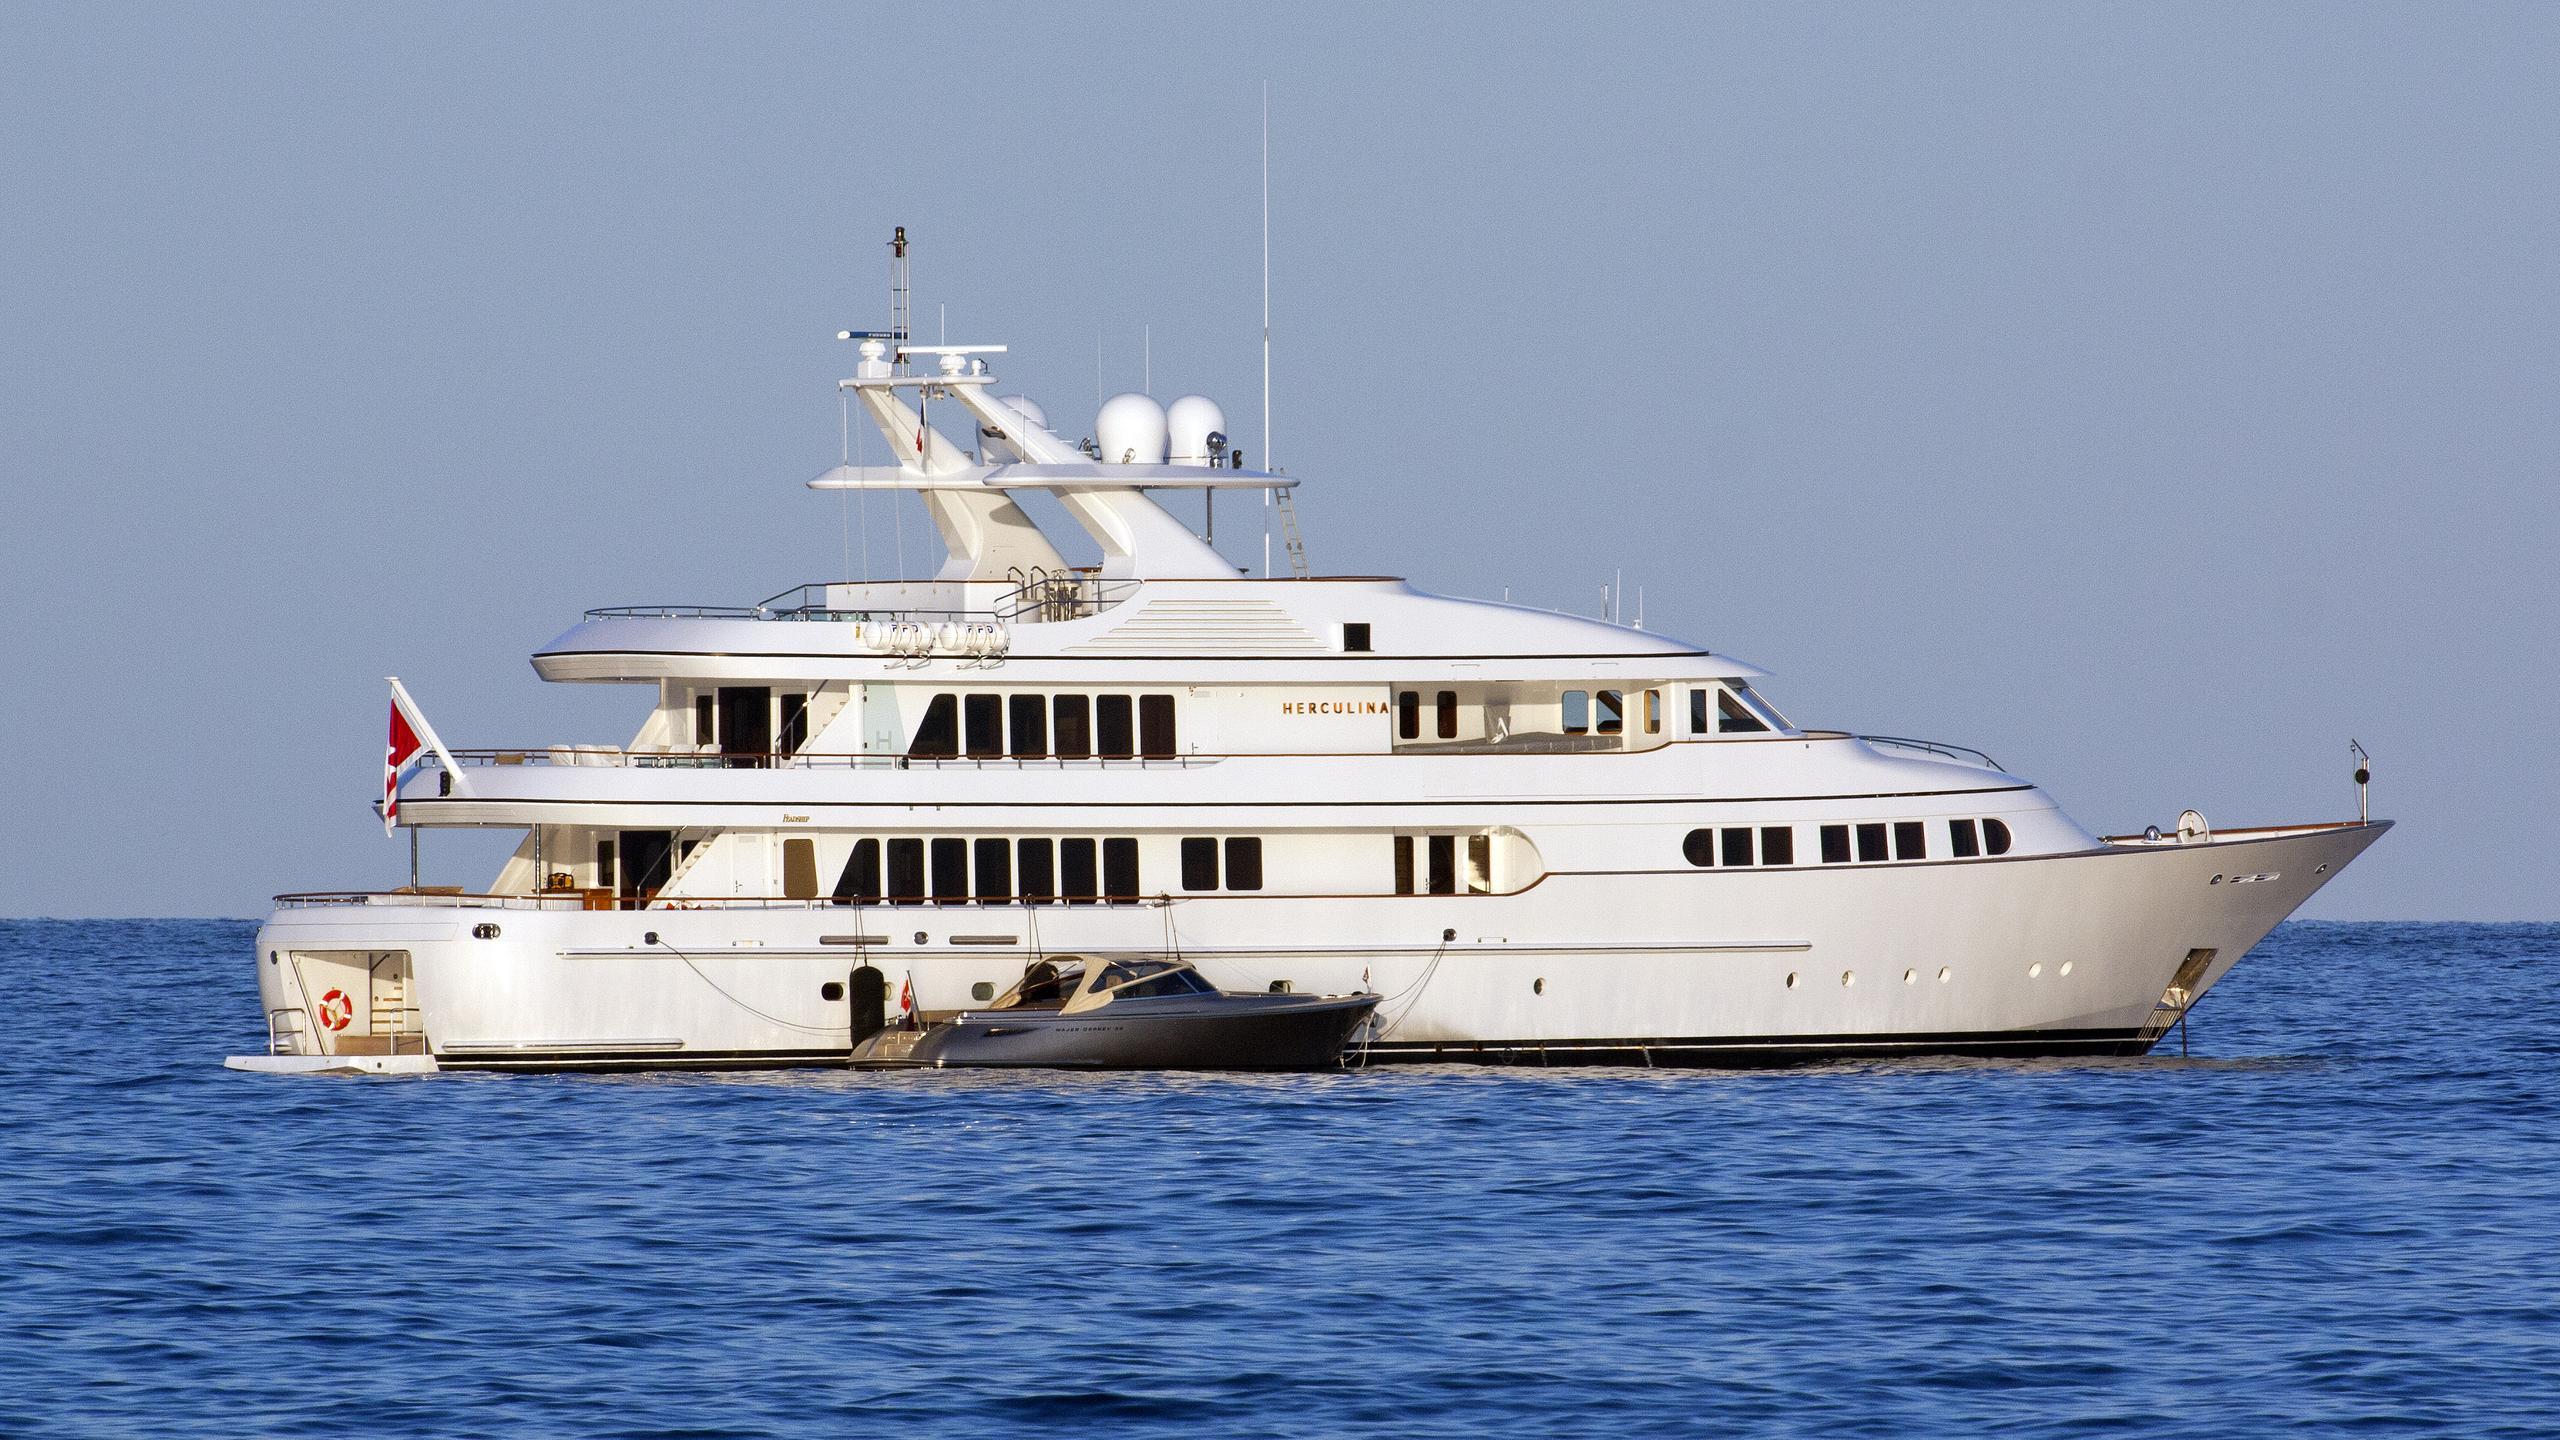 herculina-motor-yacht-feadship-1998-50m-profile